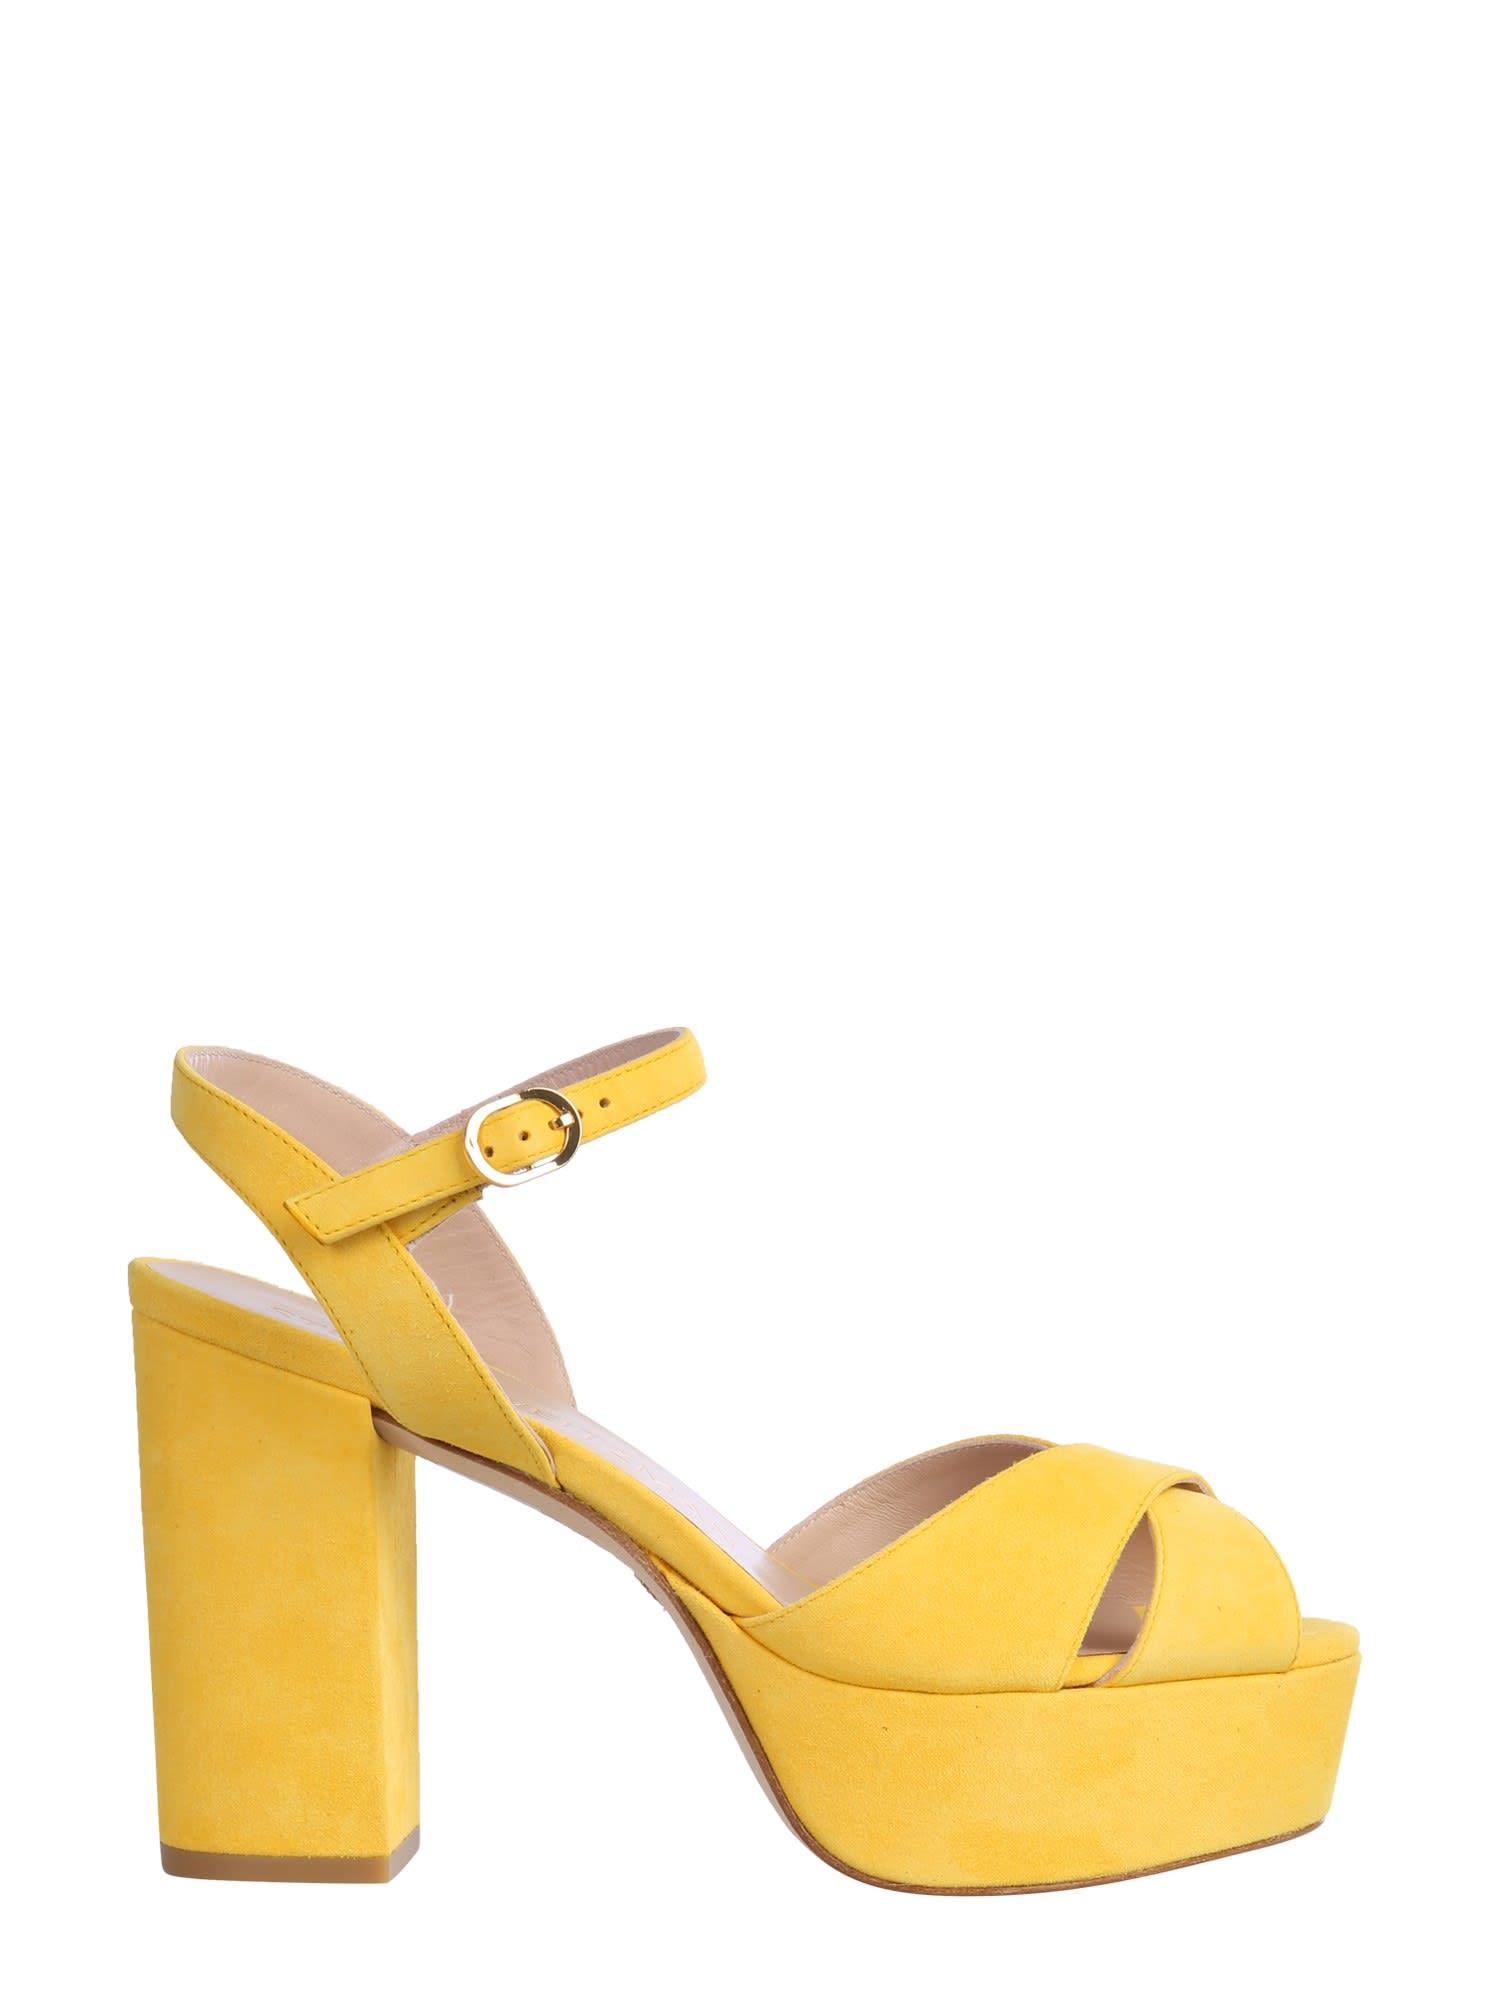 Buy Stuart Weitzman Ivona Sandal online, shop Stuart Weitzman shoes with free shipping